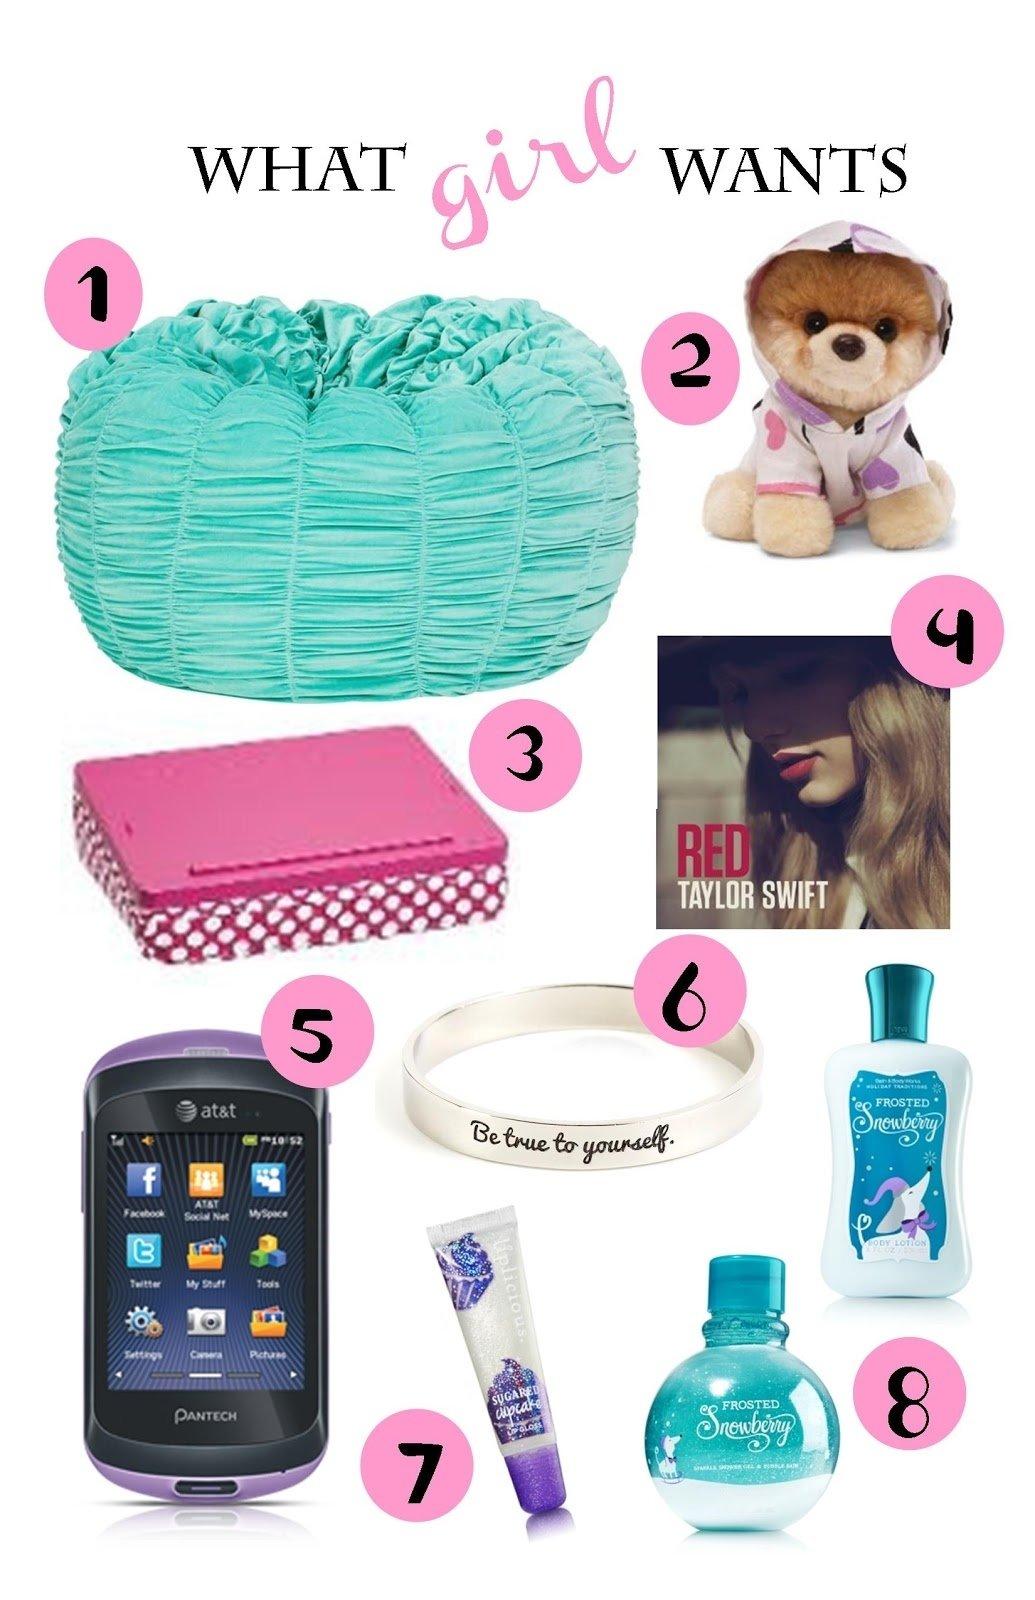 10 Wonderful Christmas Ideas For Tween Girls icing designs gift ideas for tween girls 11 2020